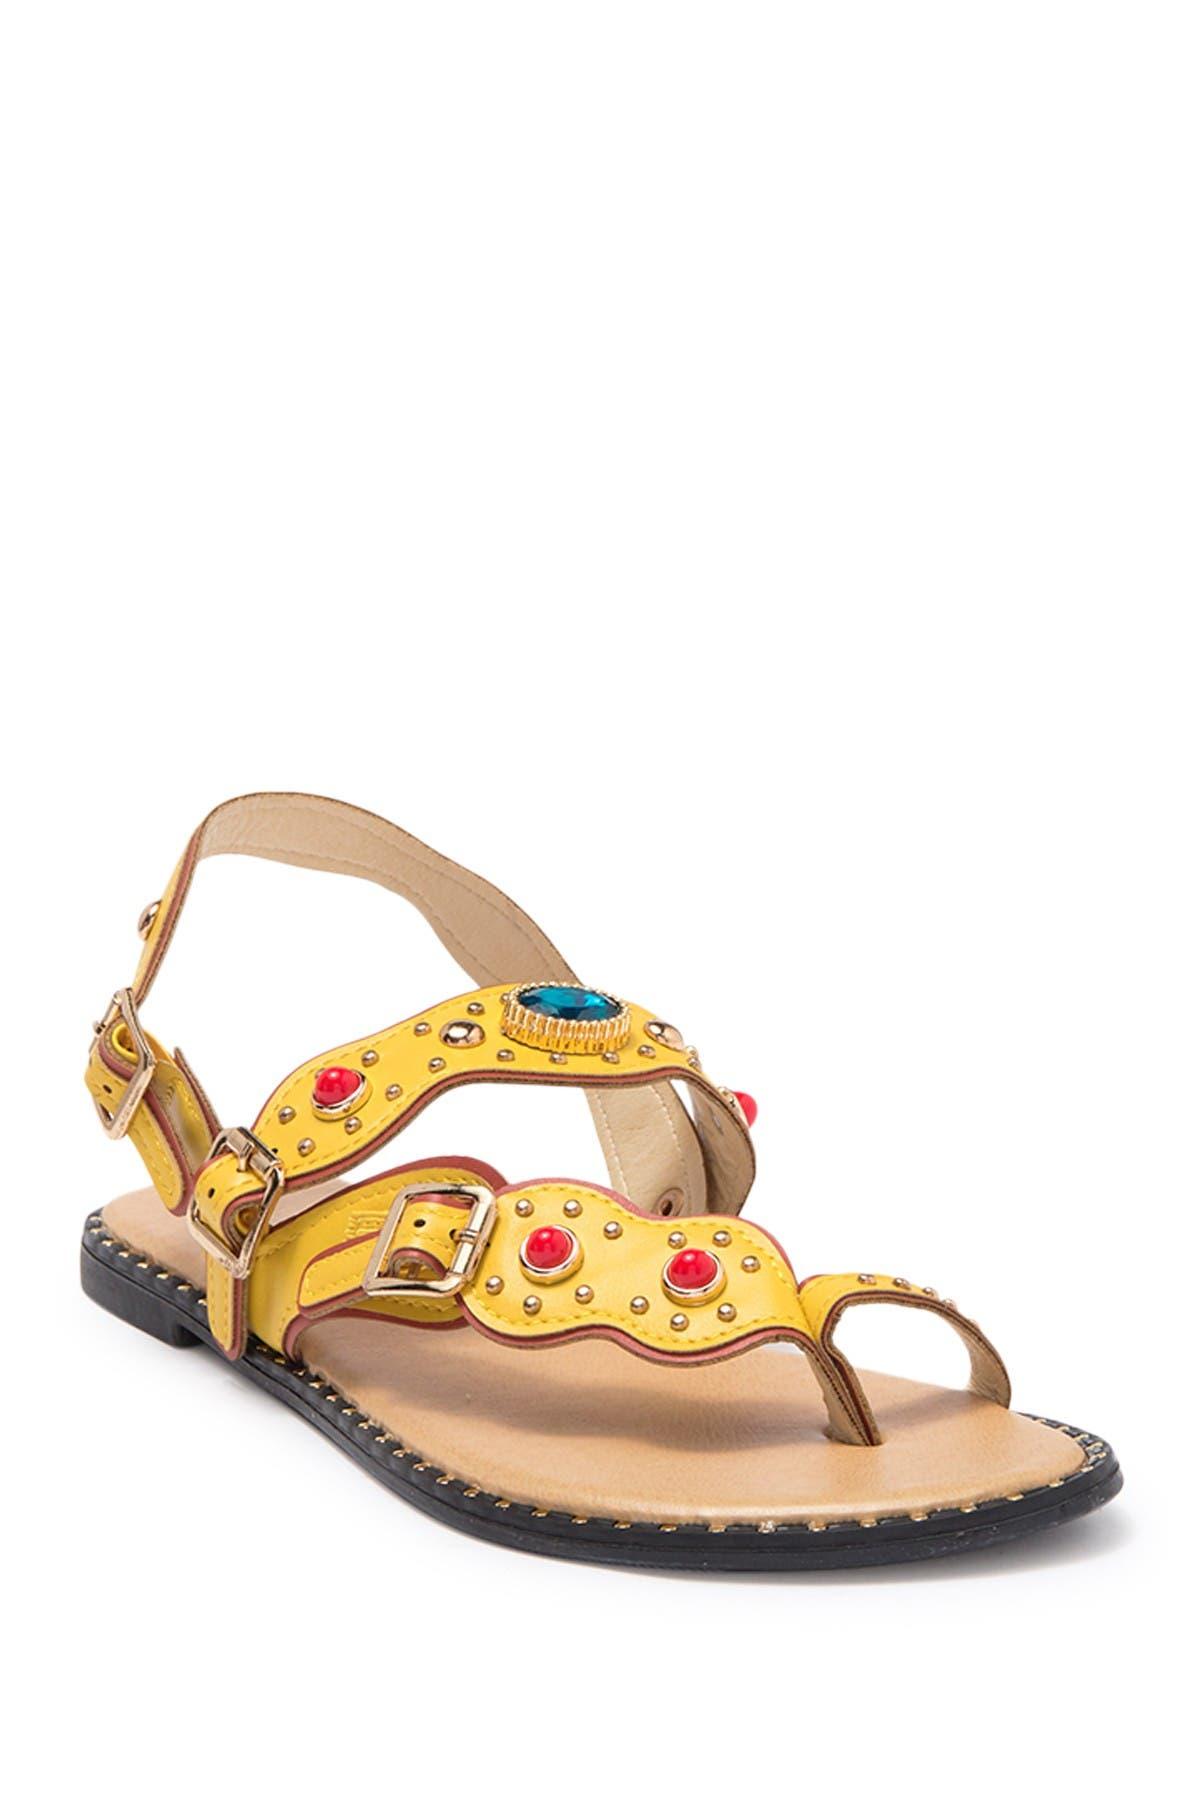 Image of Wanted Jeweled Toe Loop Sandal